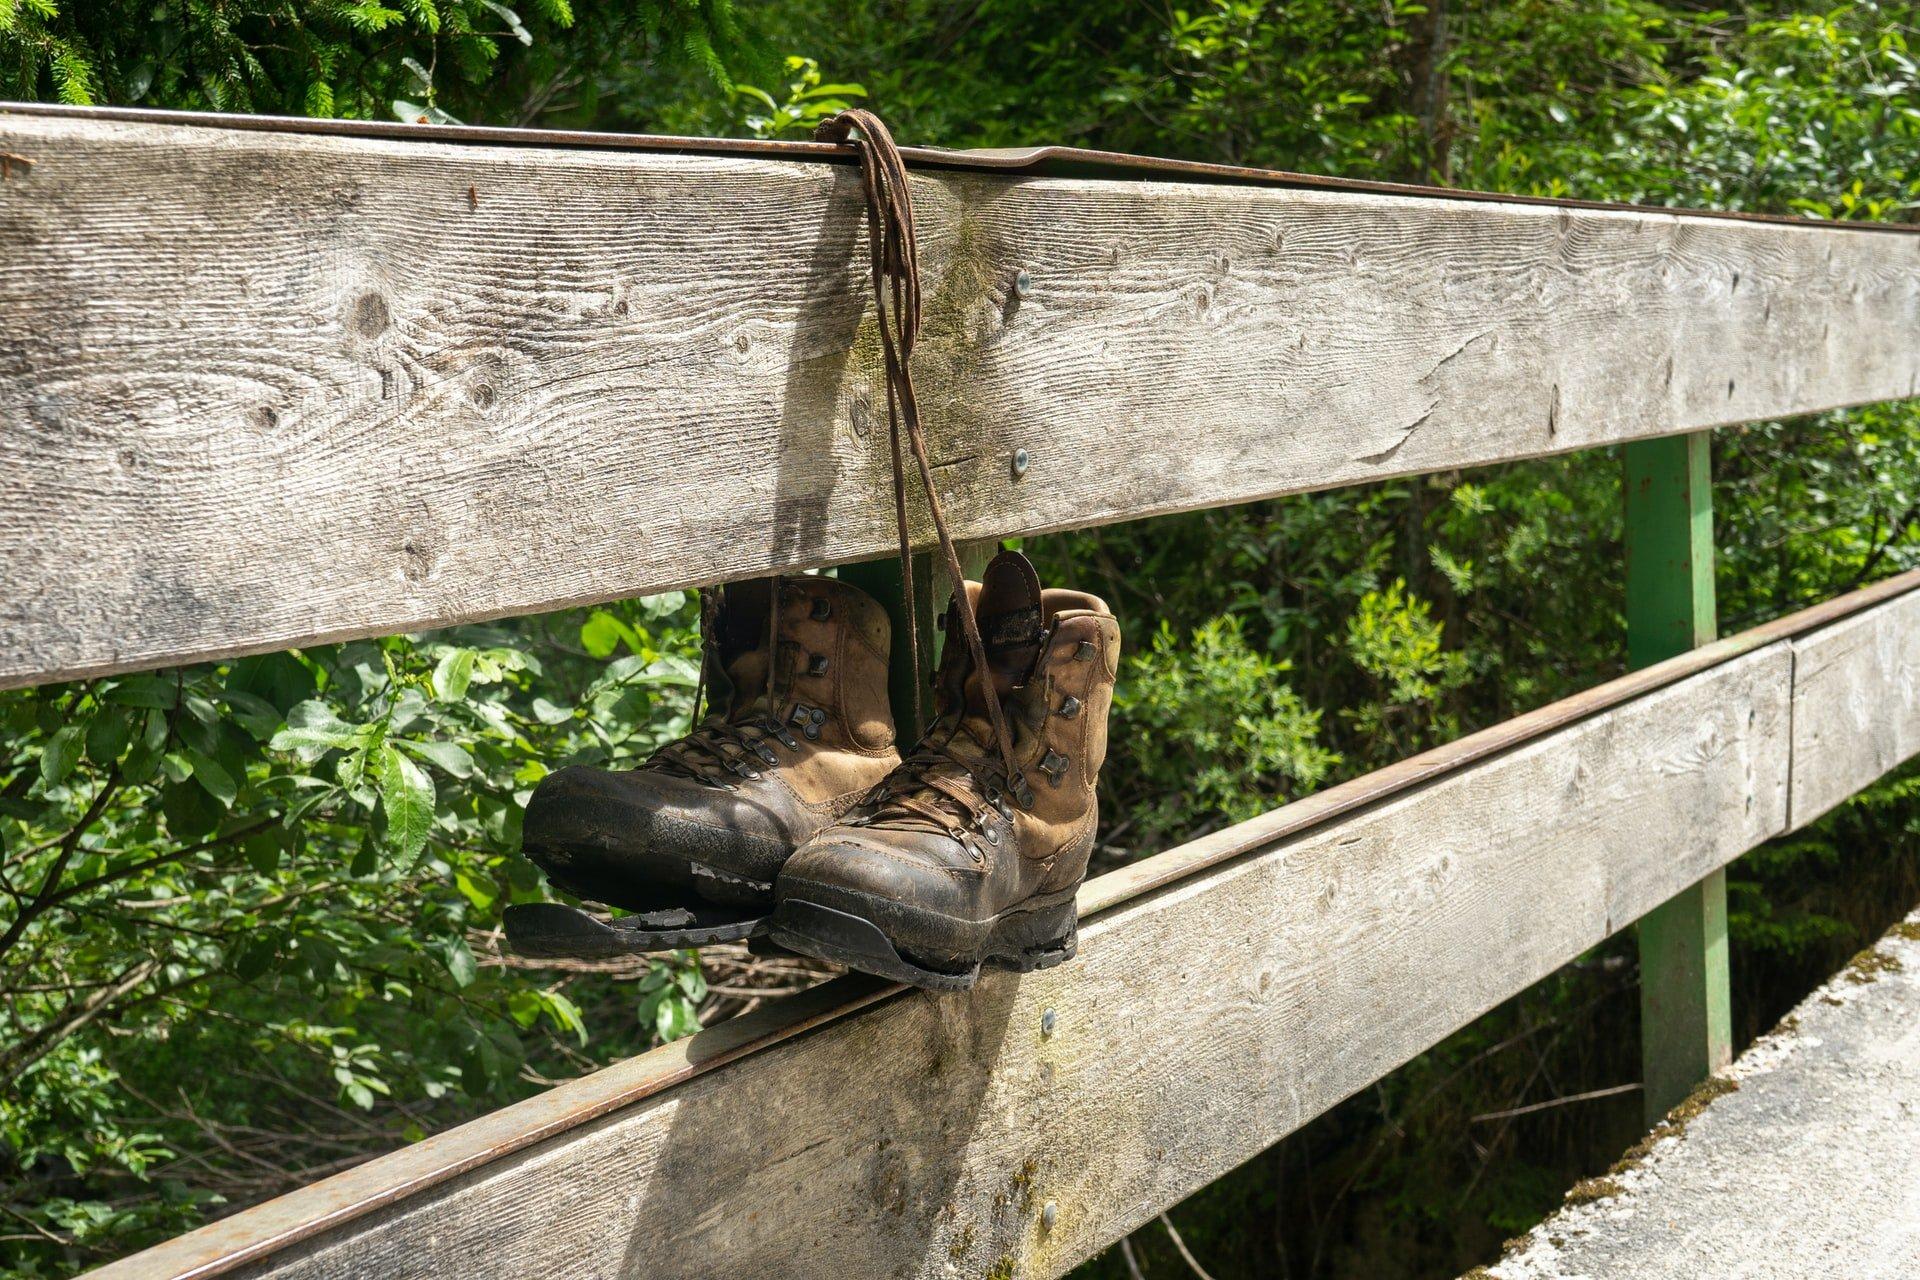 Hiking boots (photo: Ian Taylor, Unsplash)